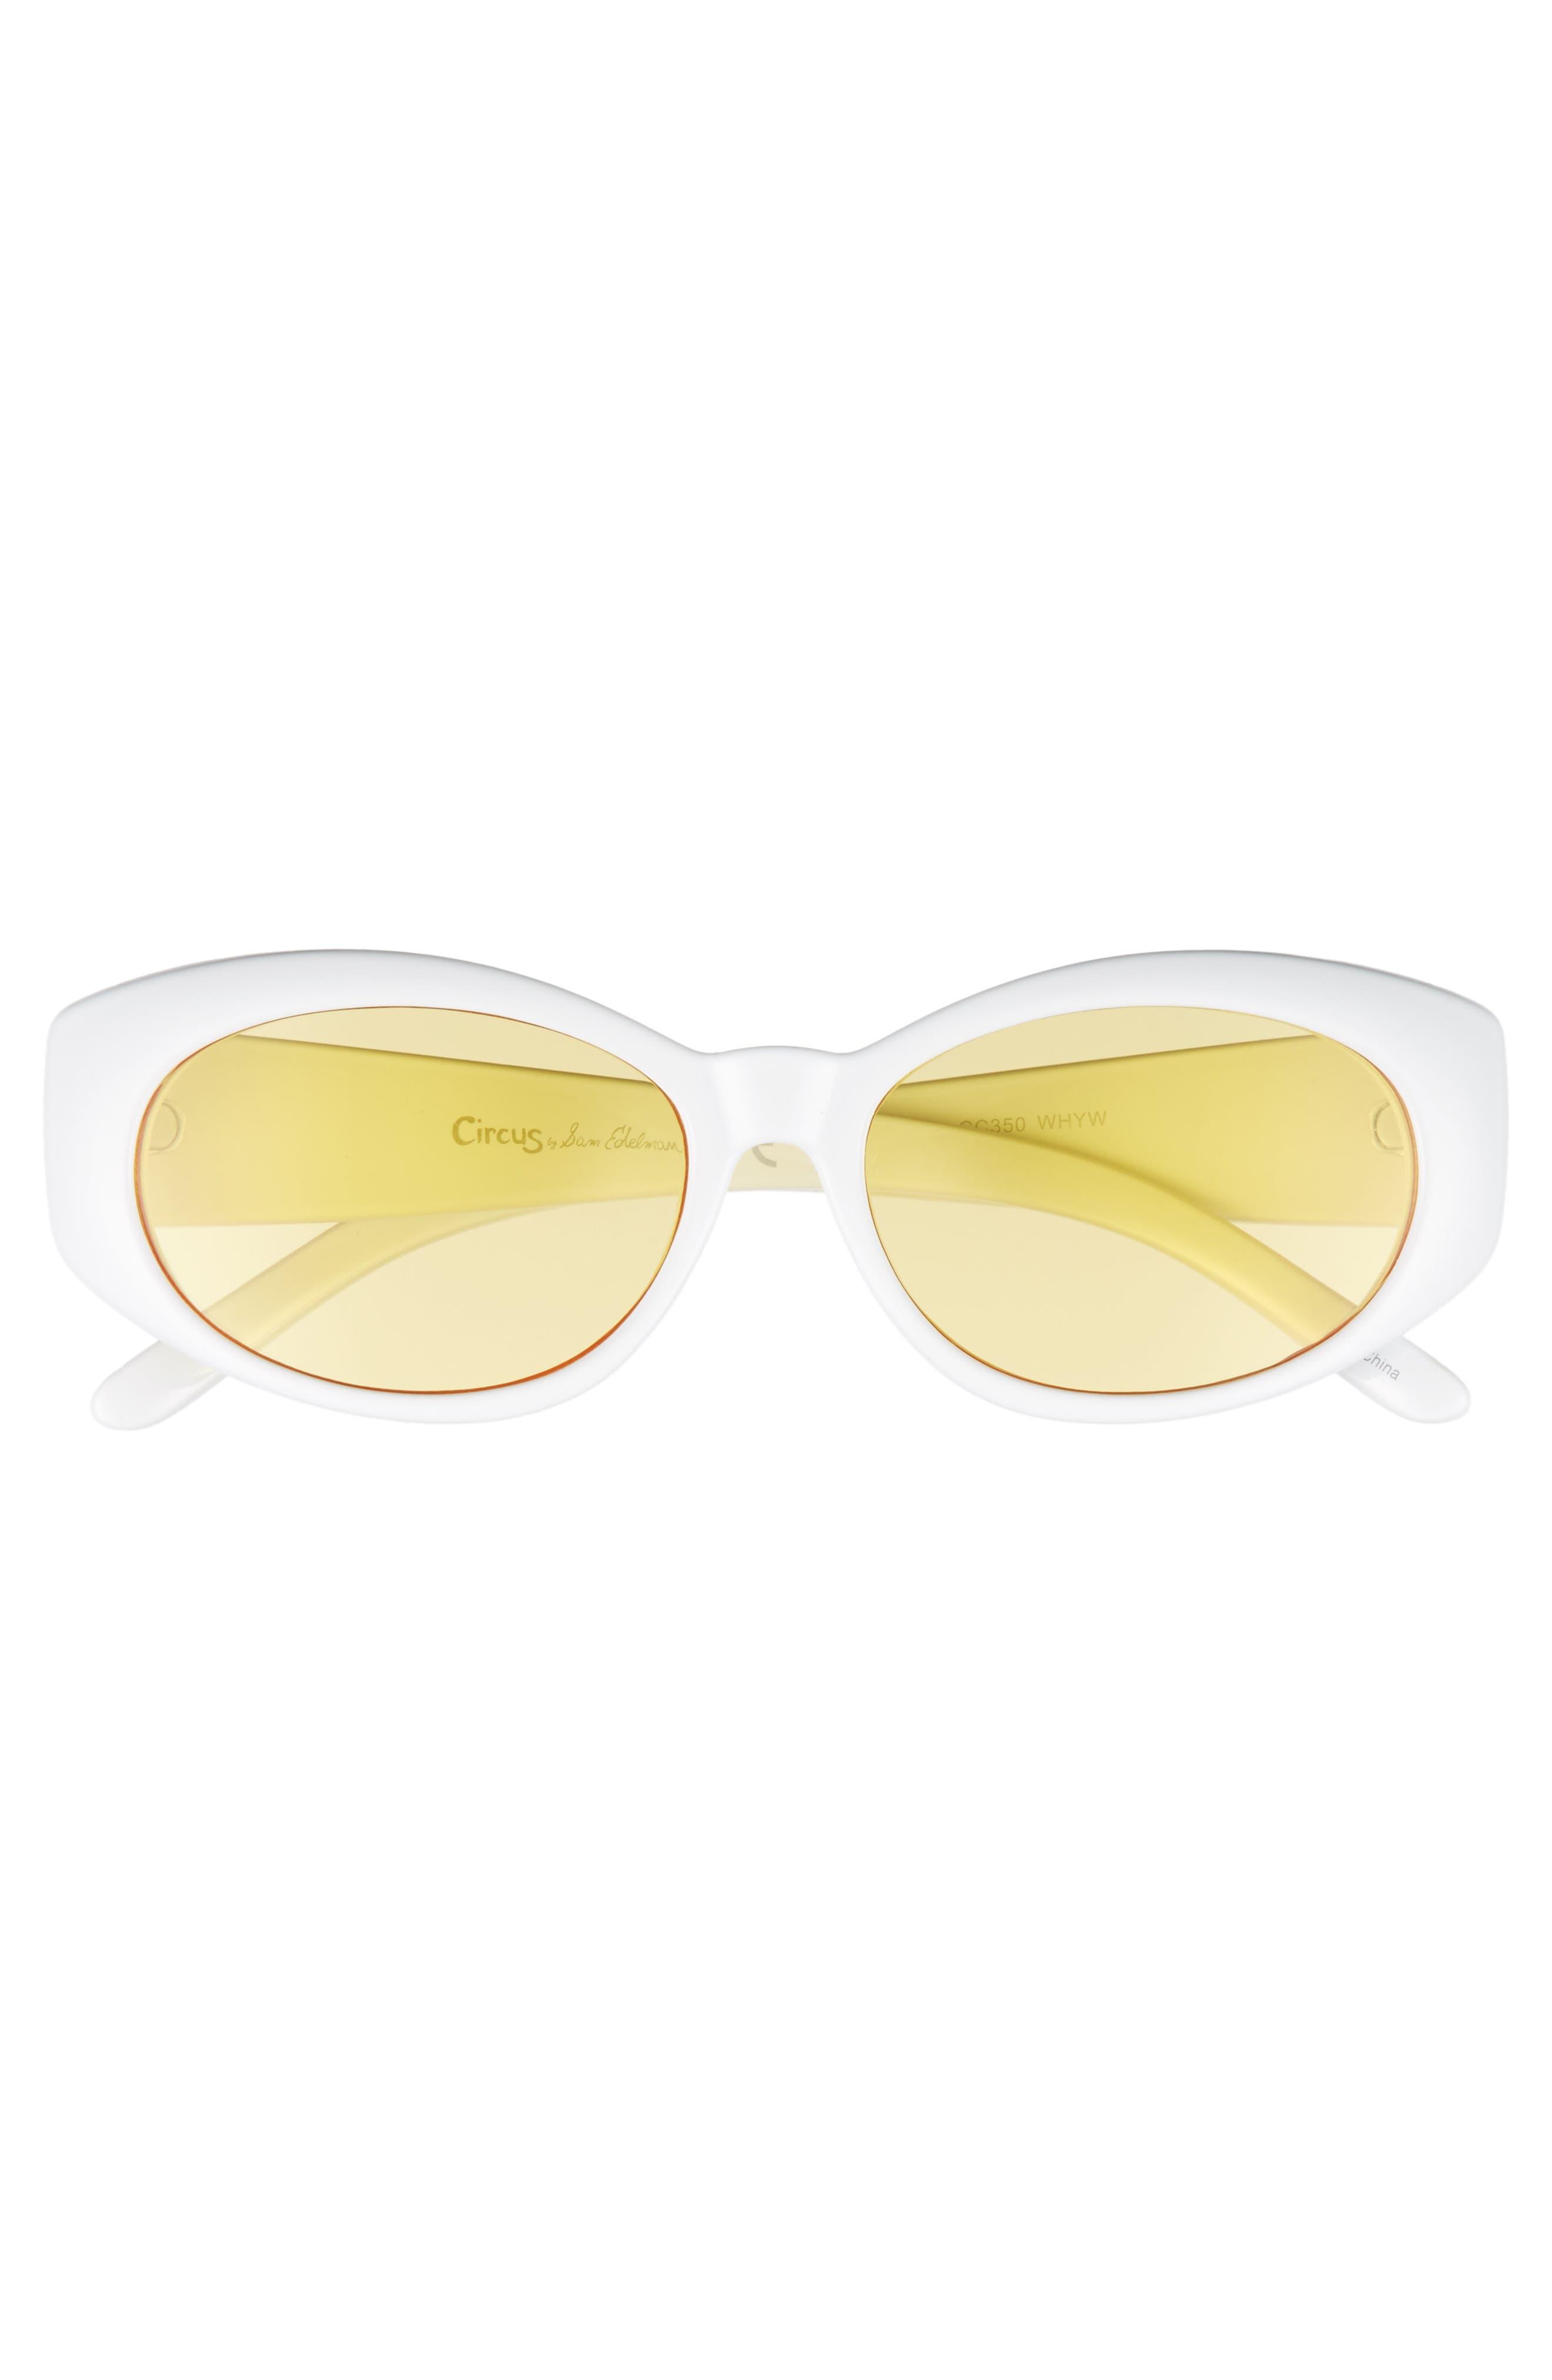 68mm Oval Sunglasses,                             Alternate thumbnail 3, color,                             102